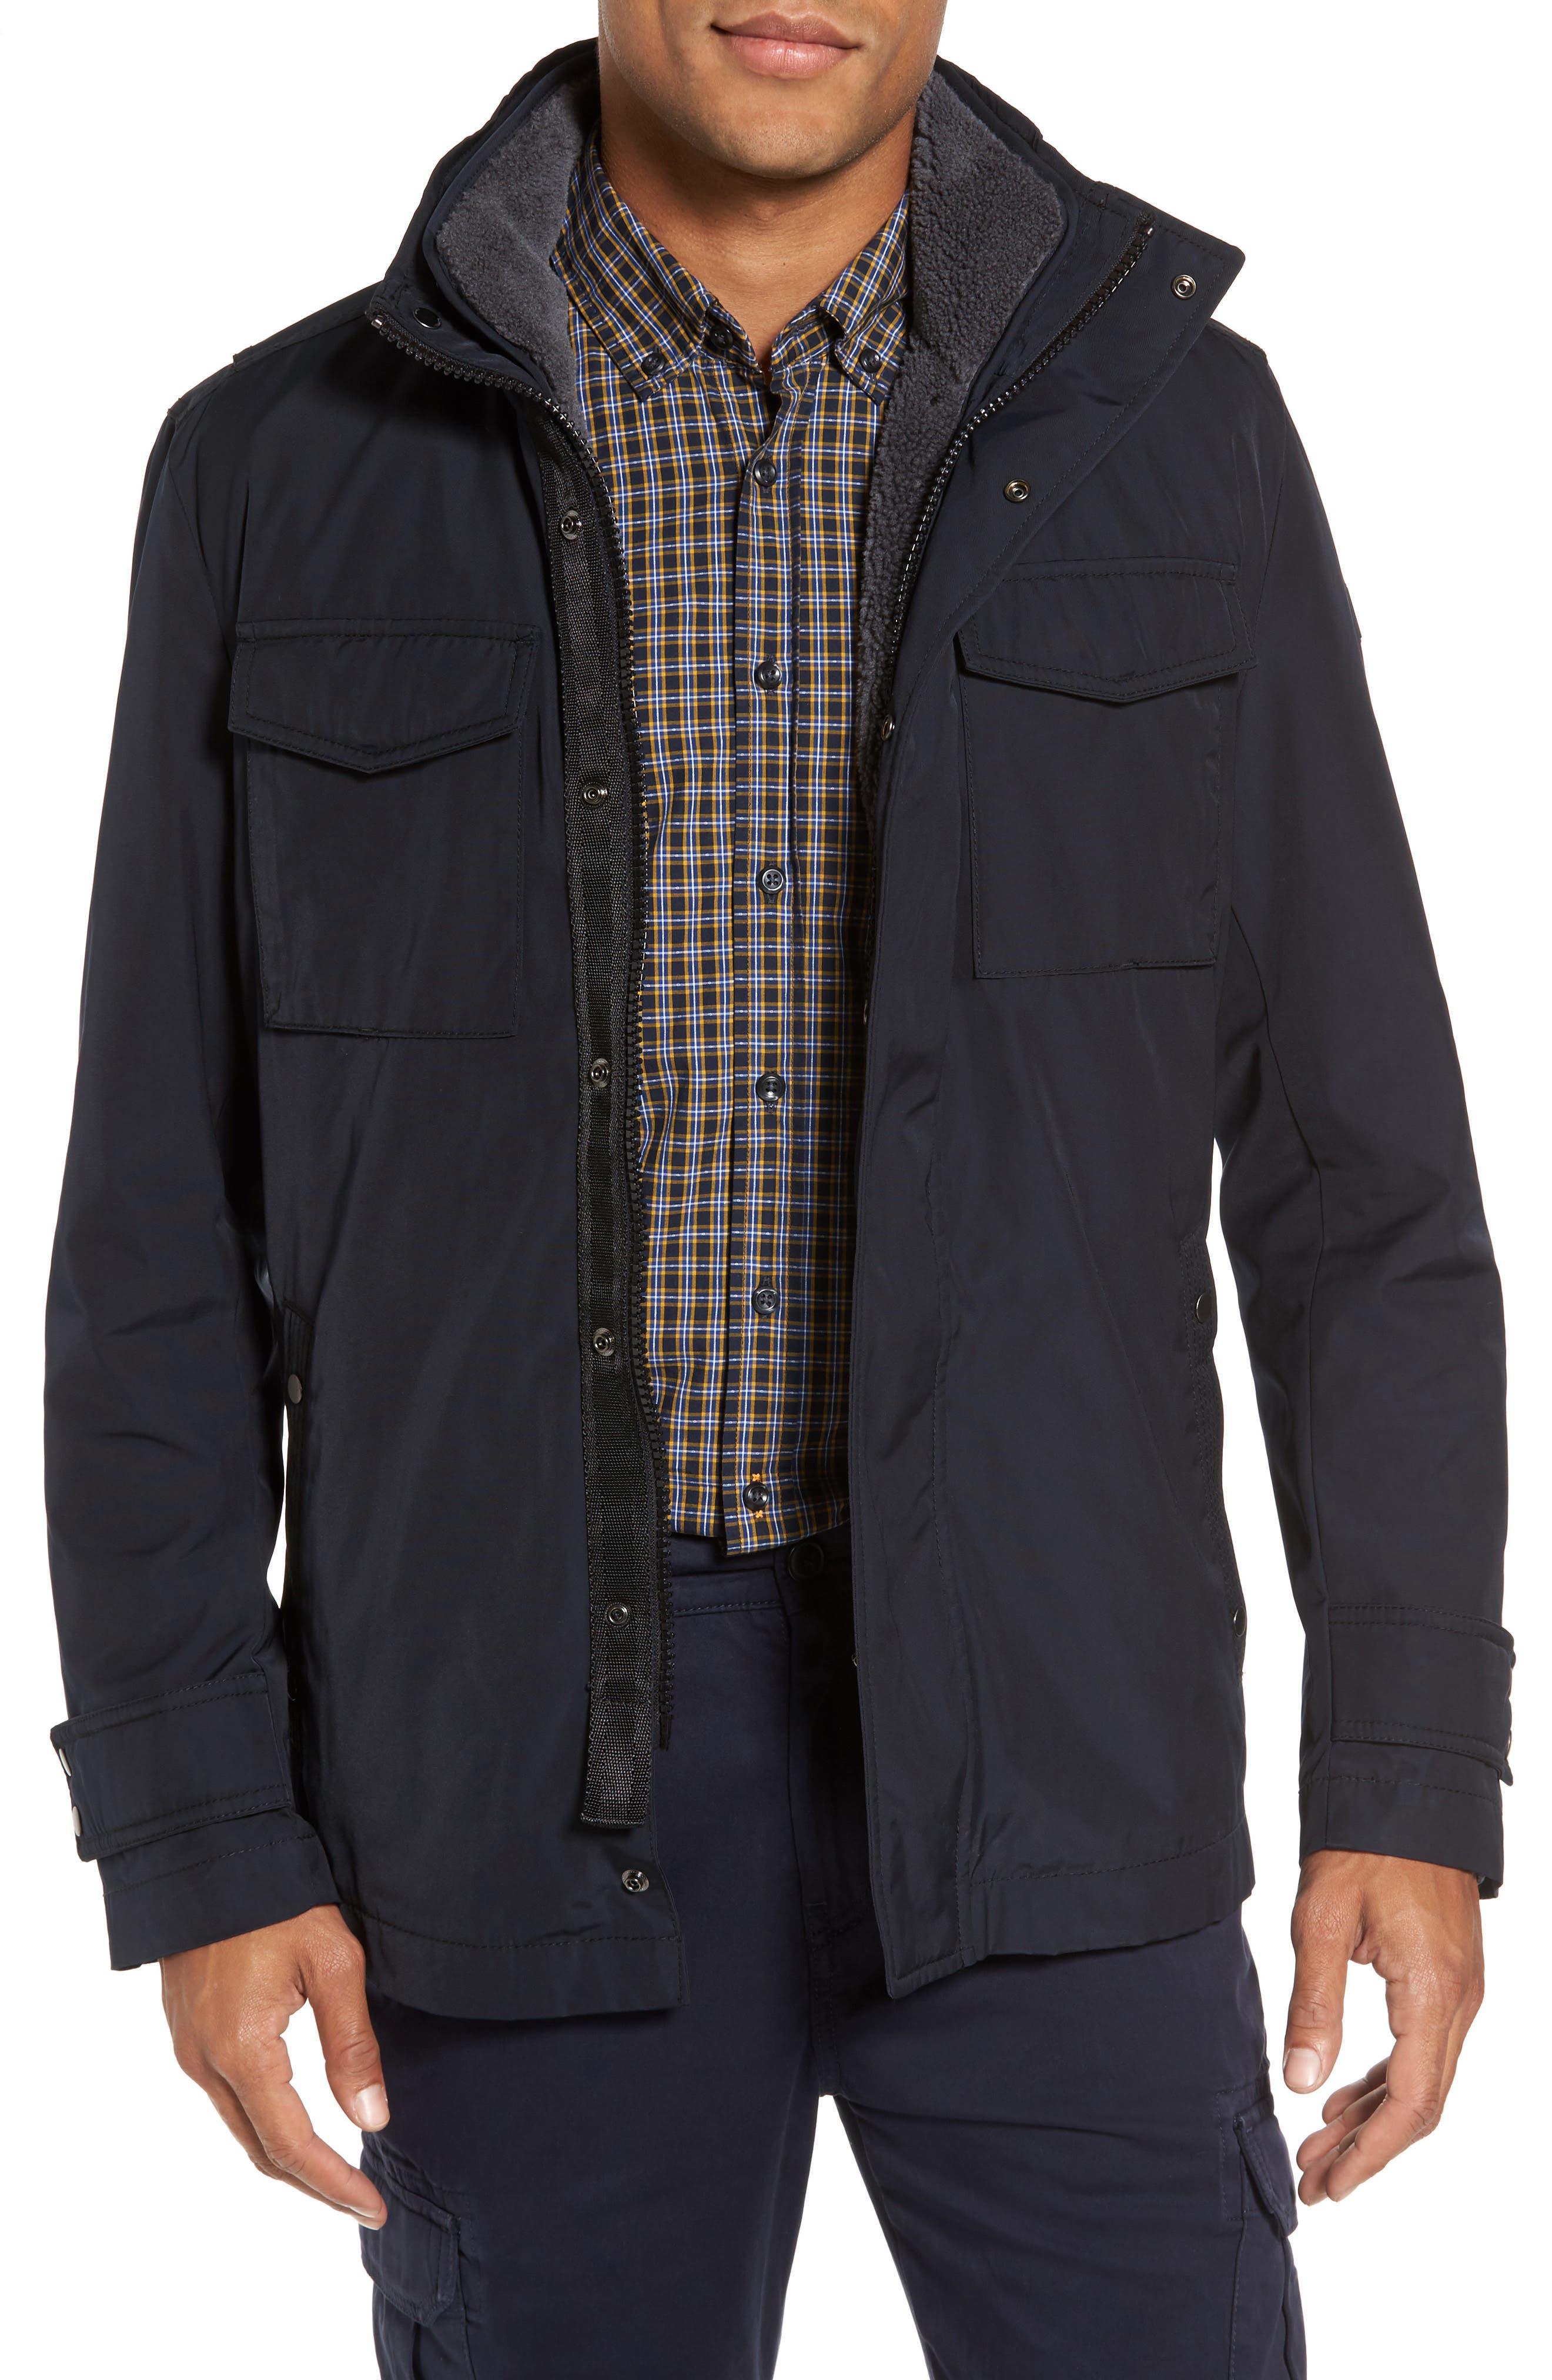 Onick Water Repellent 3-in-1 Field Jacket,                         Main,                         color, Black